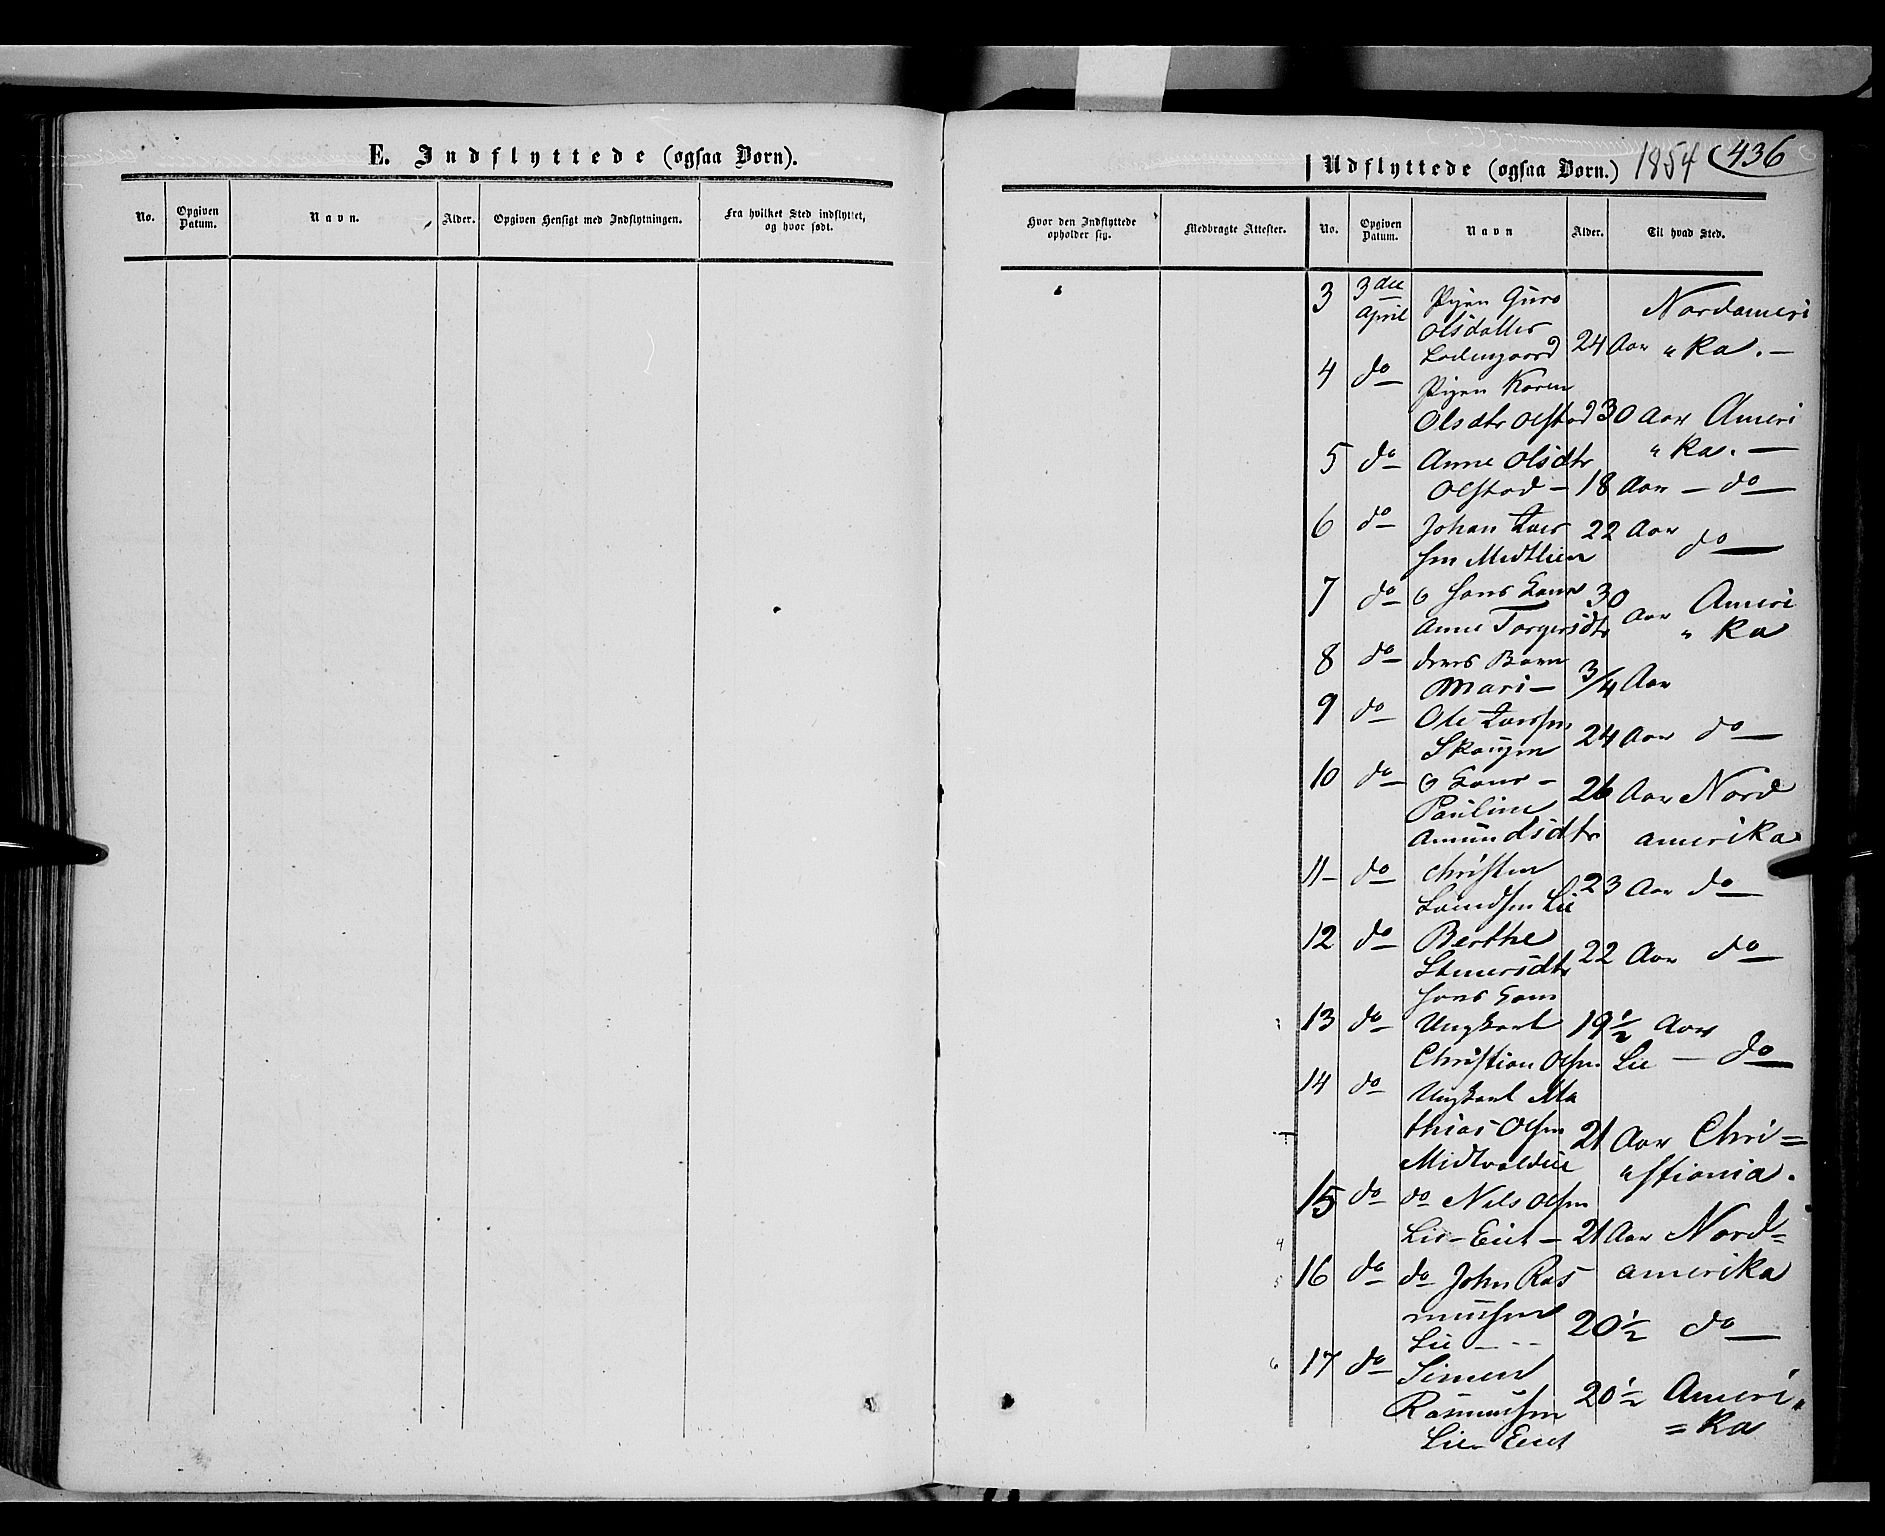 SAH, Gausdal prestekontor, Ministerialbok nr. 8, 1850-1861, s. 436